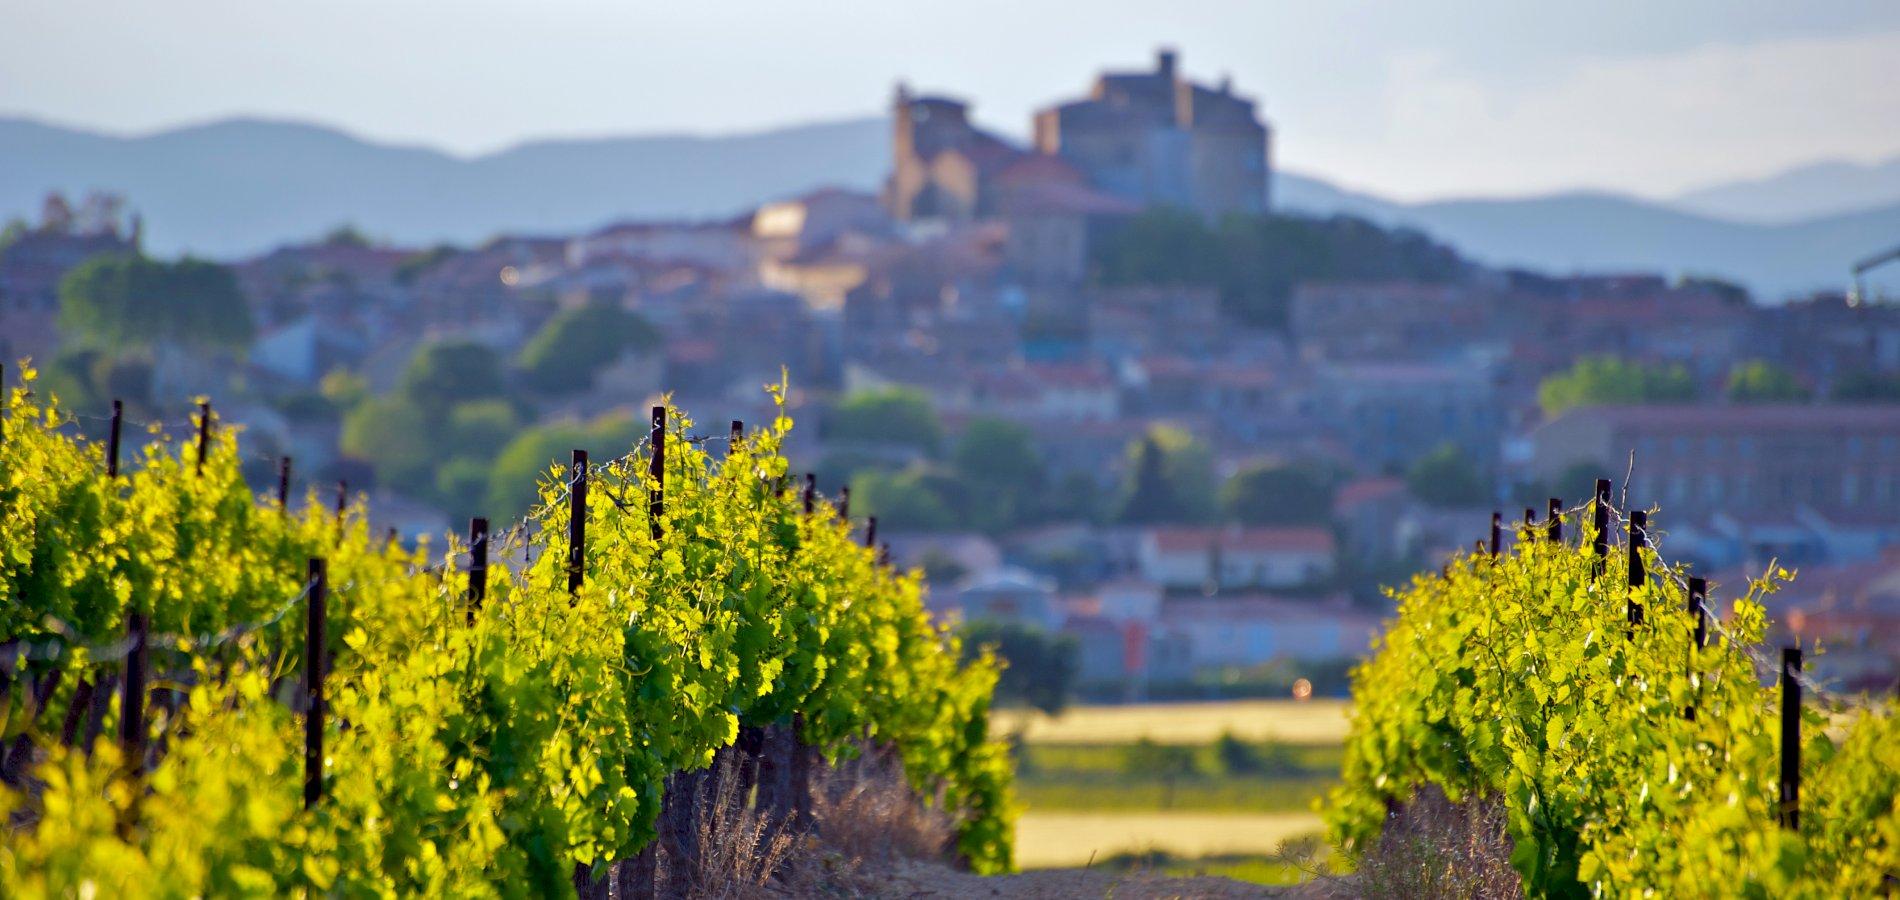 Ophorus Tours - Languedoc Wine Tour Private Shore Excursion From Sète